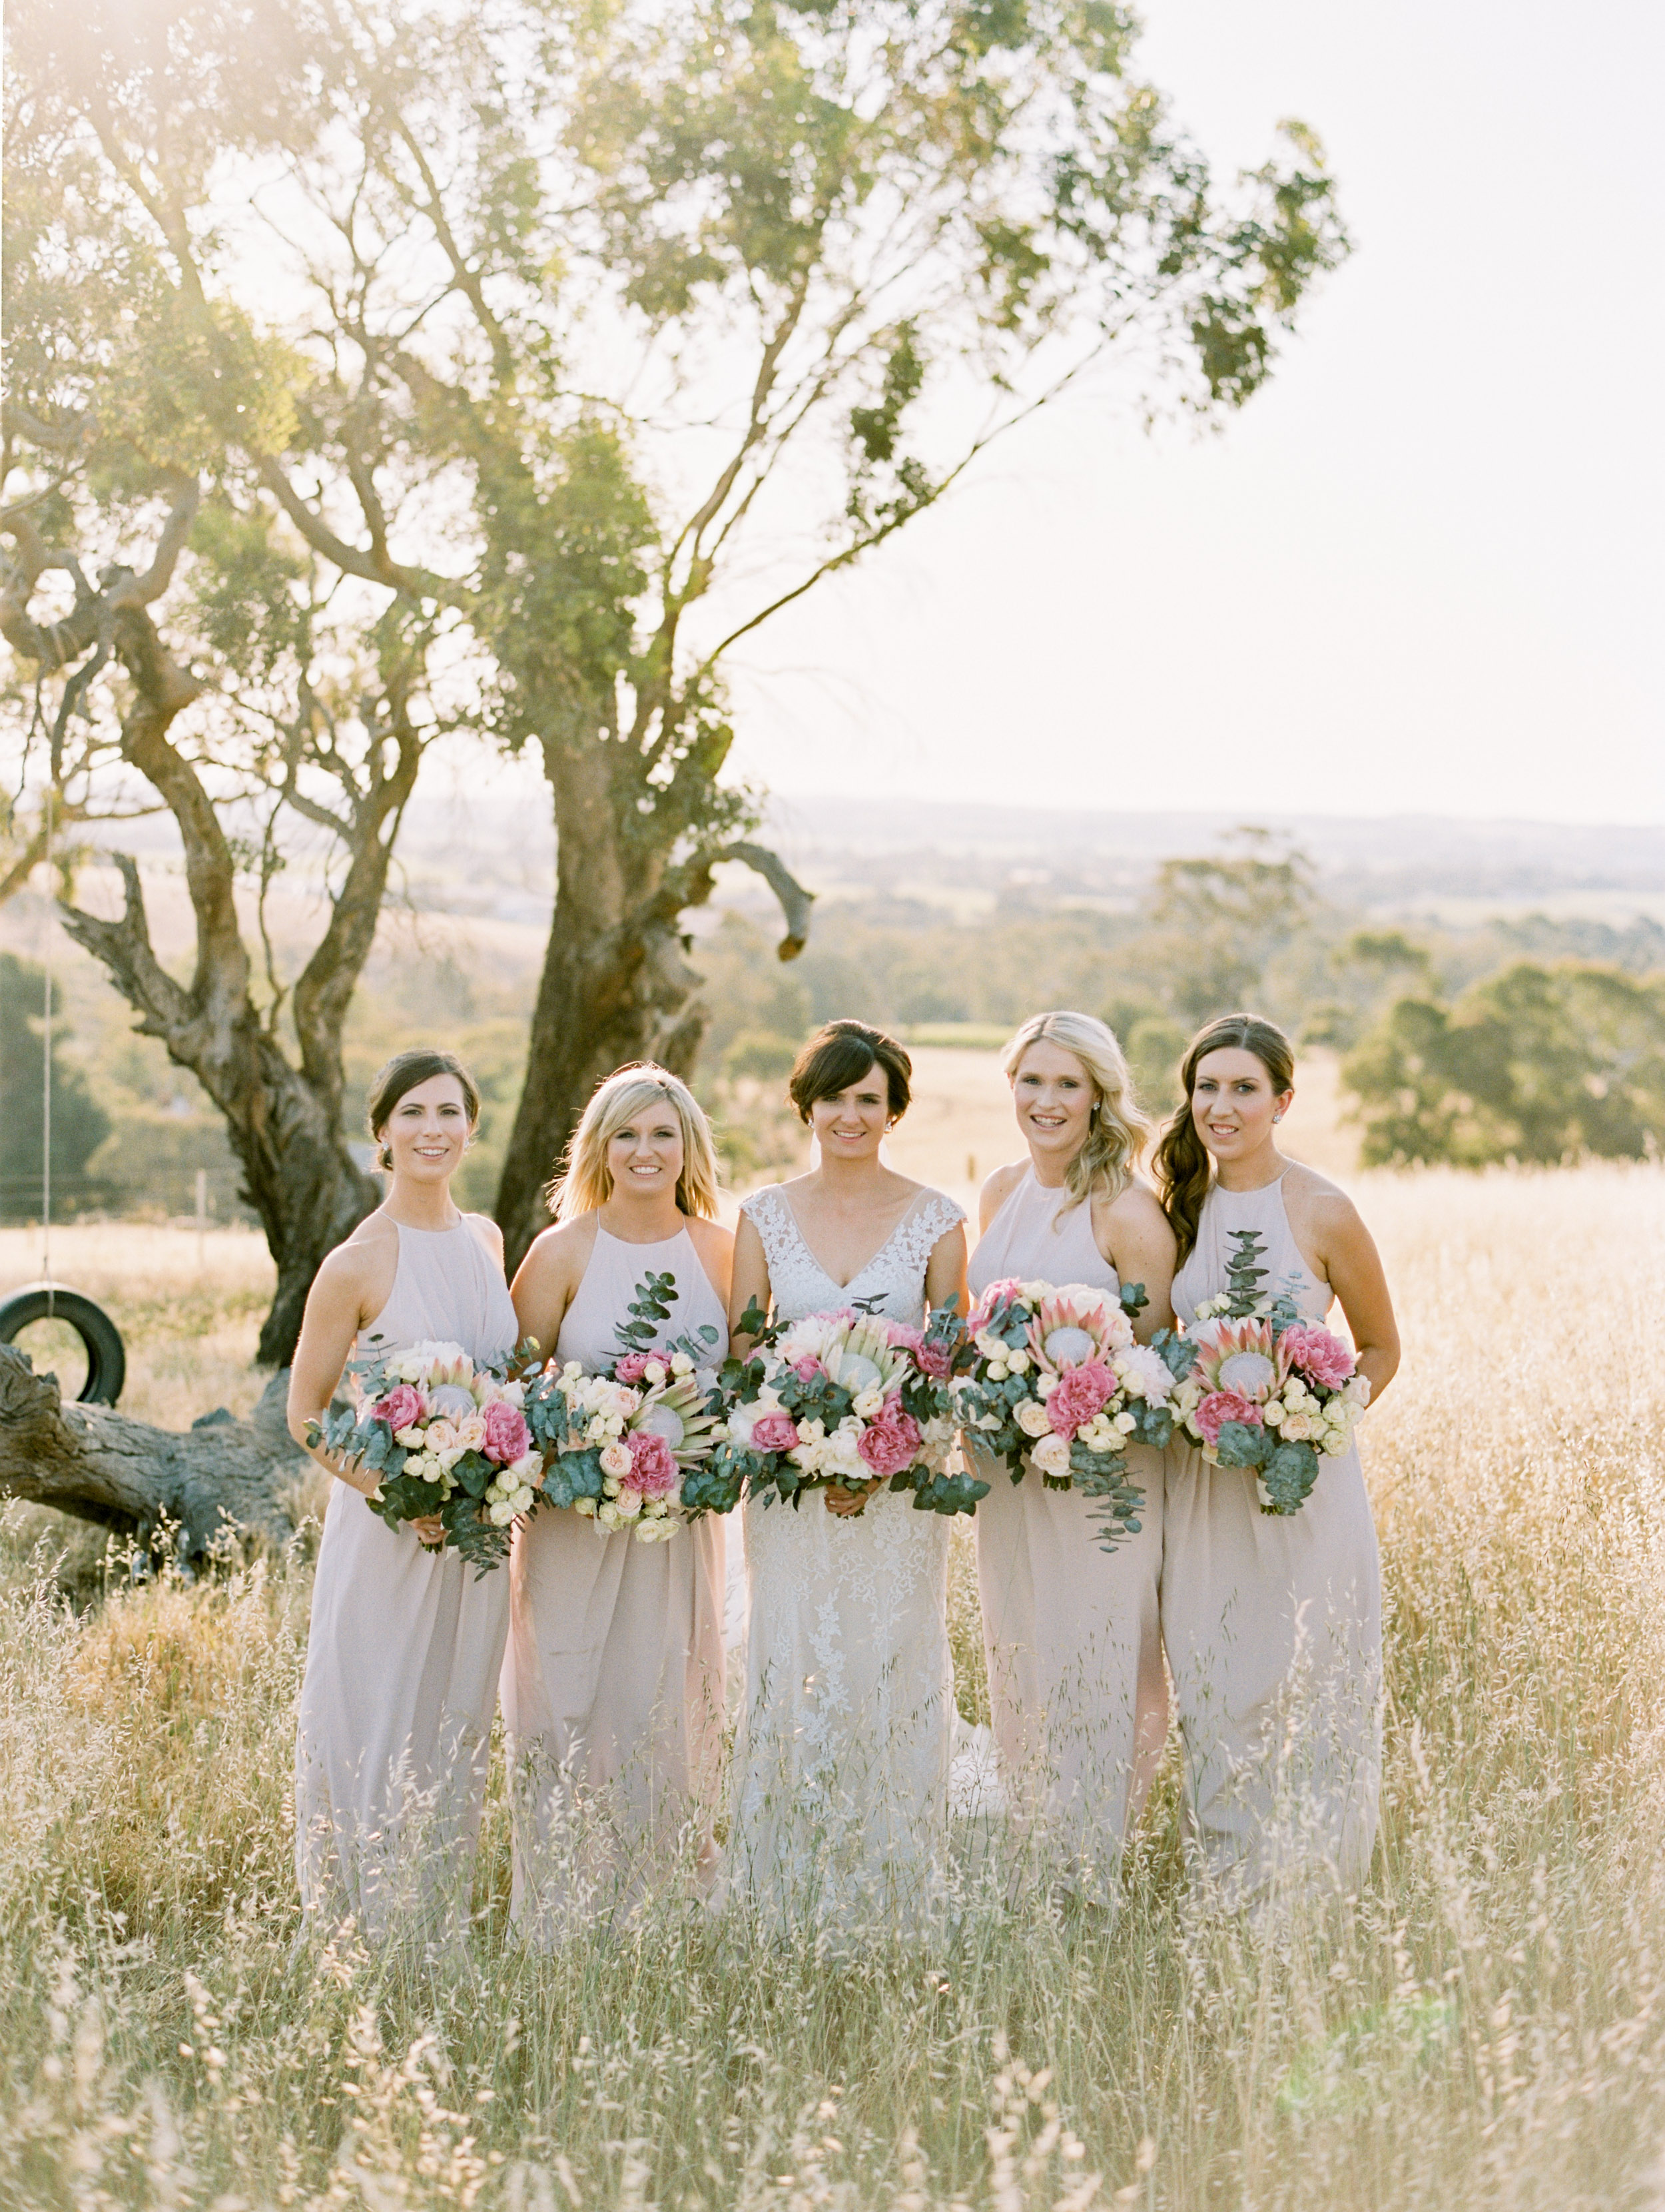 Union_Chapel_Barossa_Valley_Wedding-072.jpg